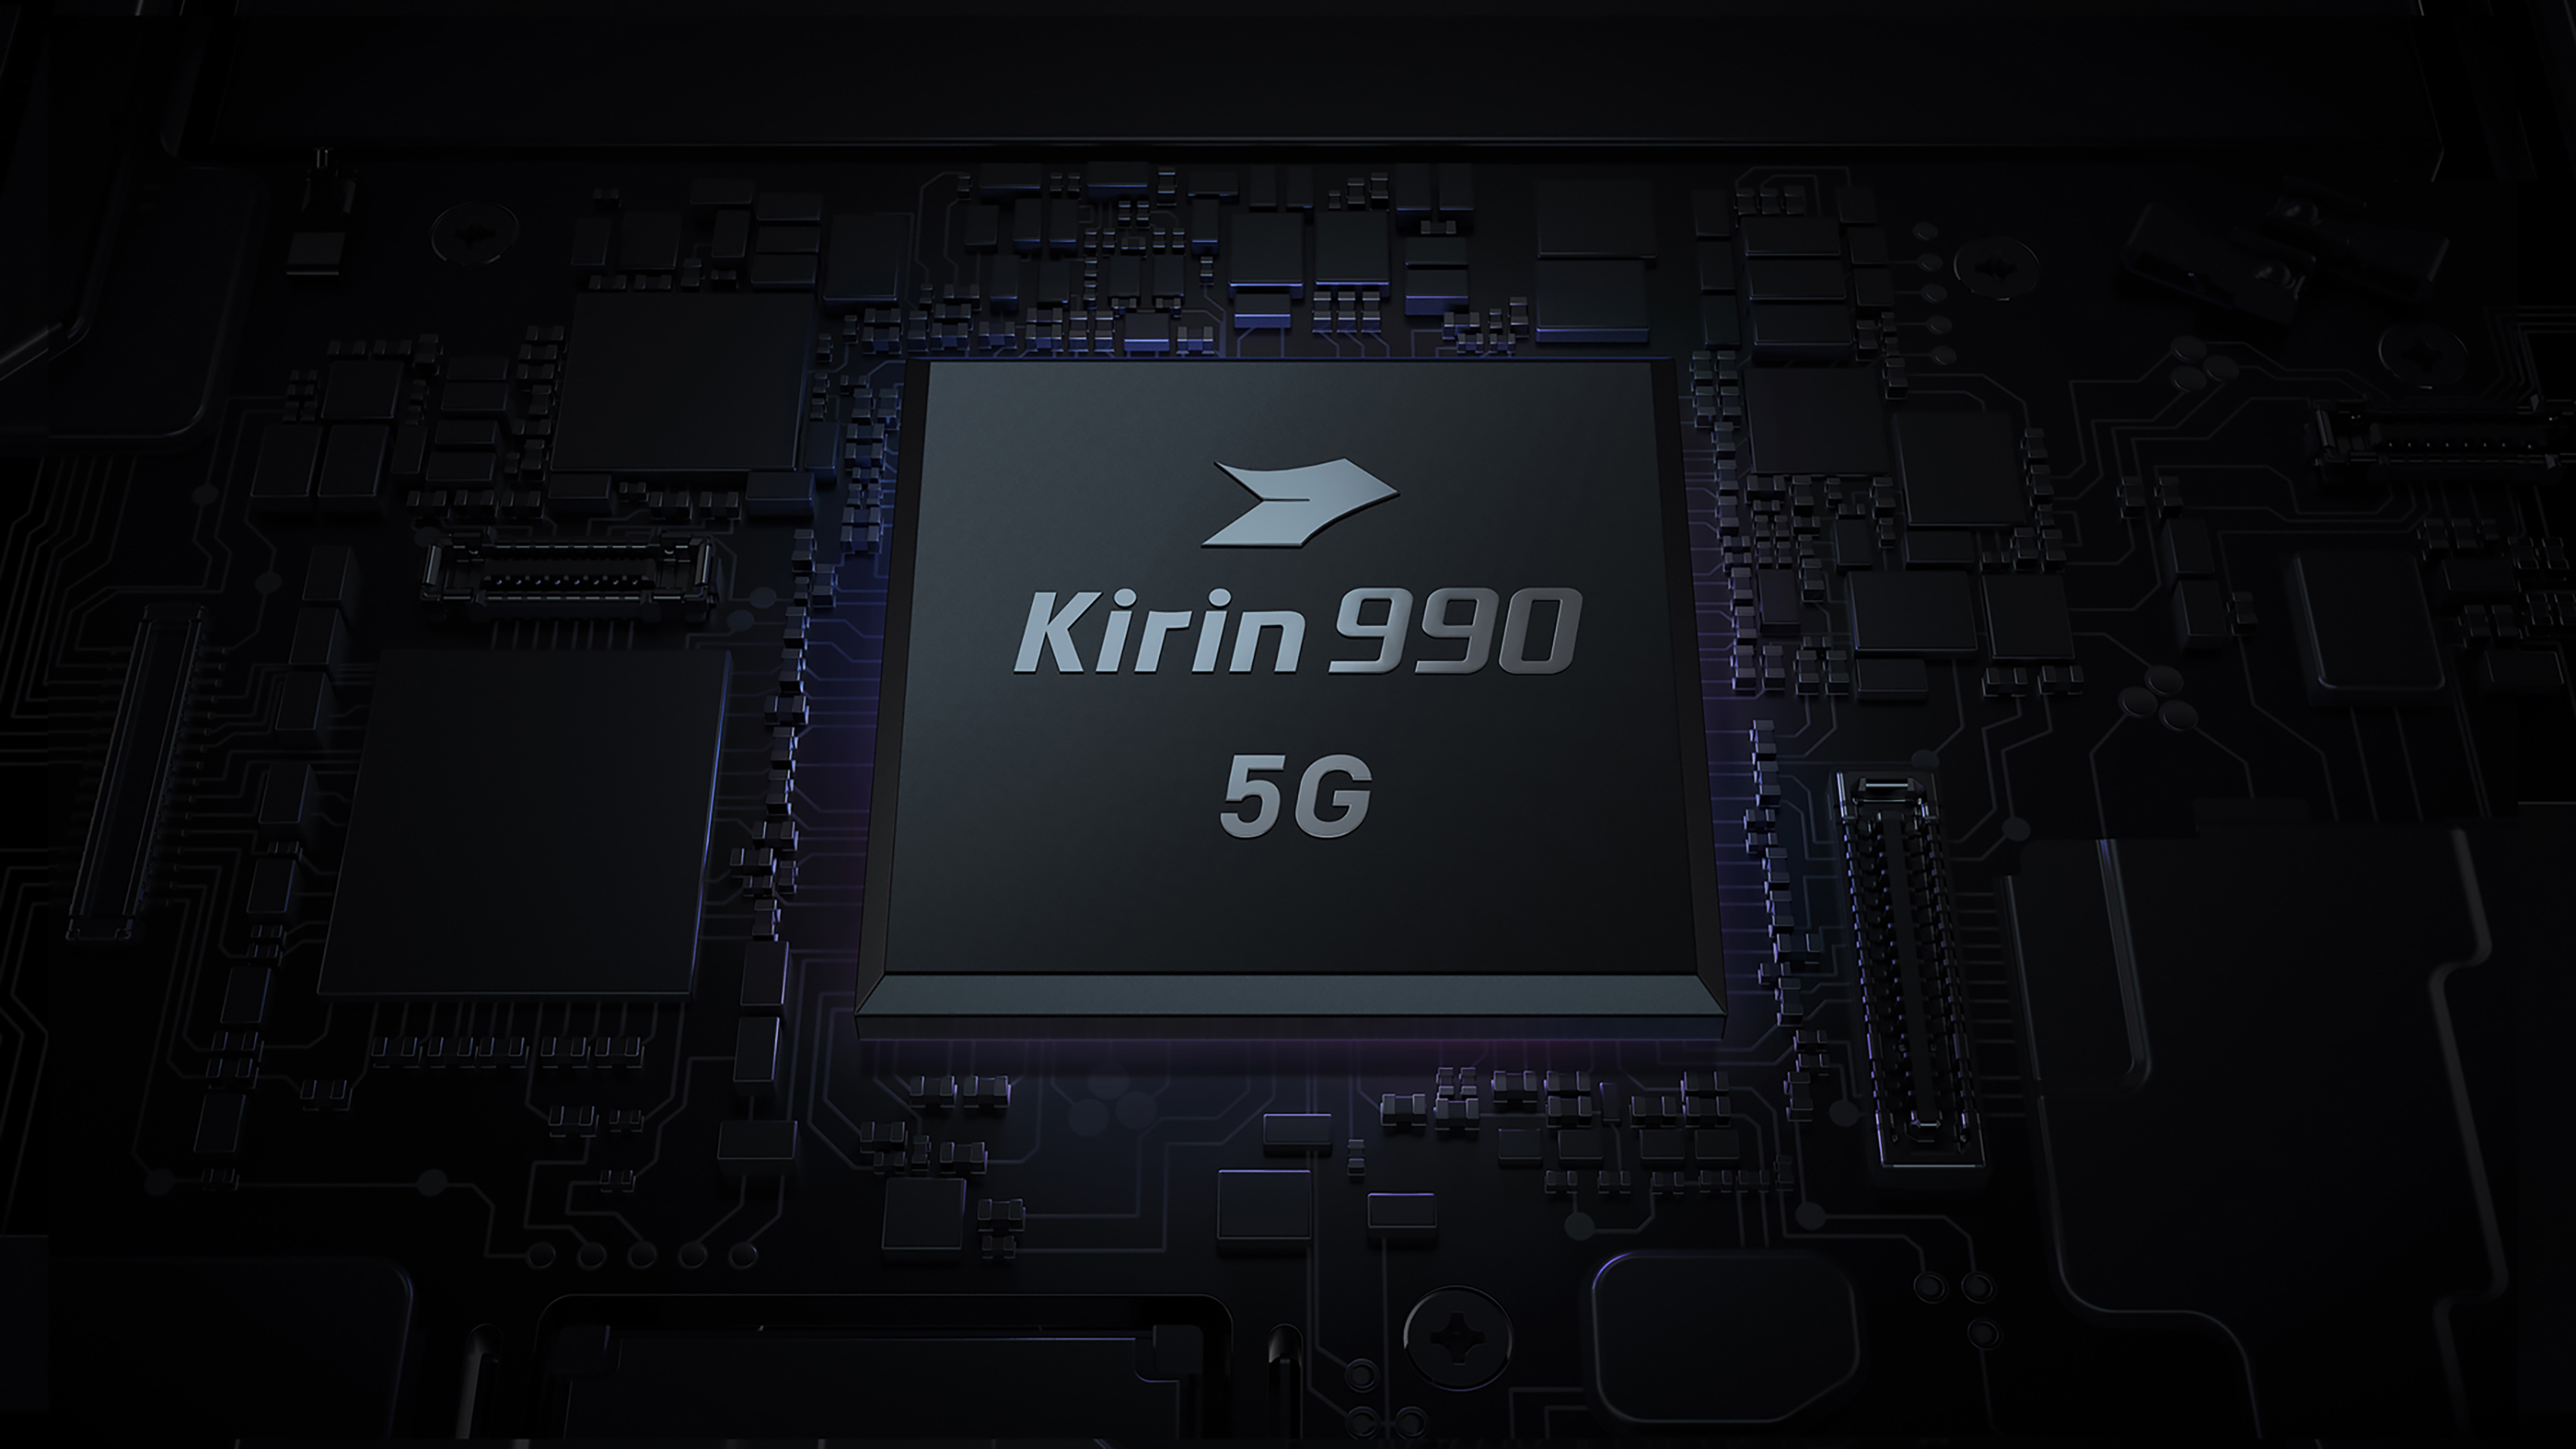 HUAWEI】Kirin 990 5G